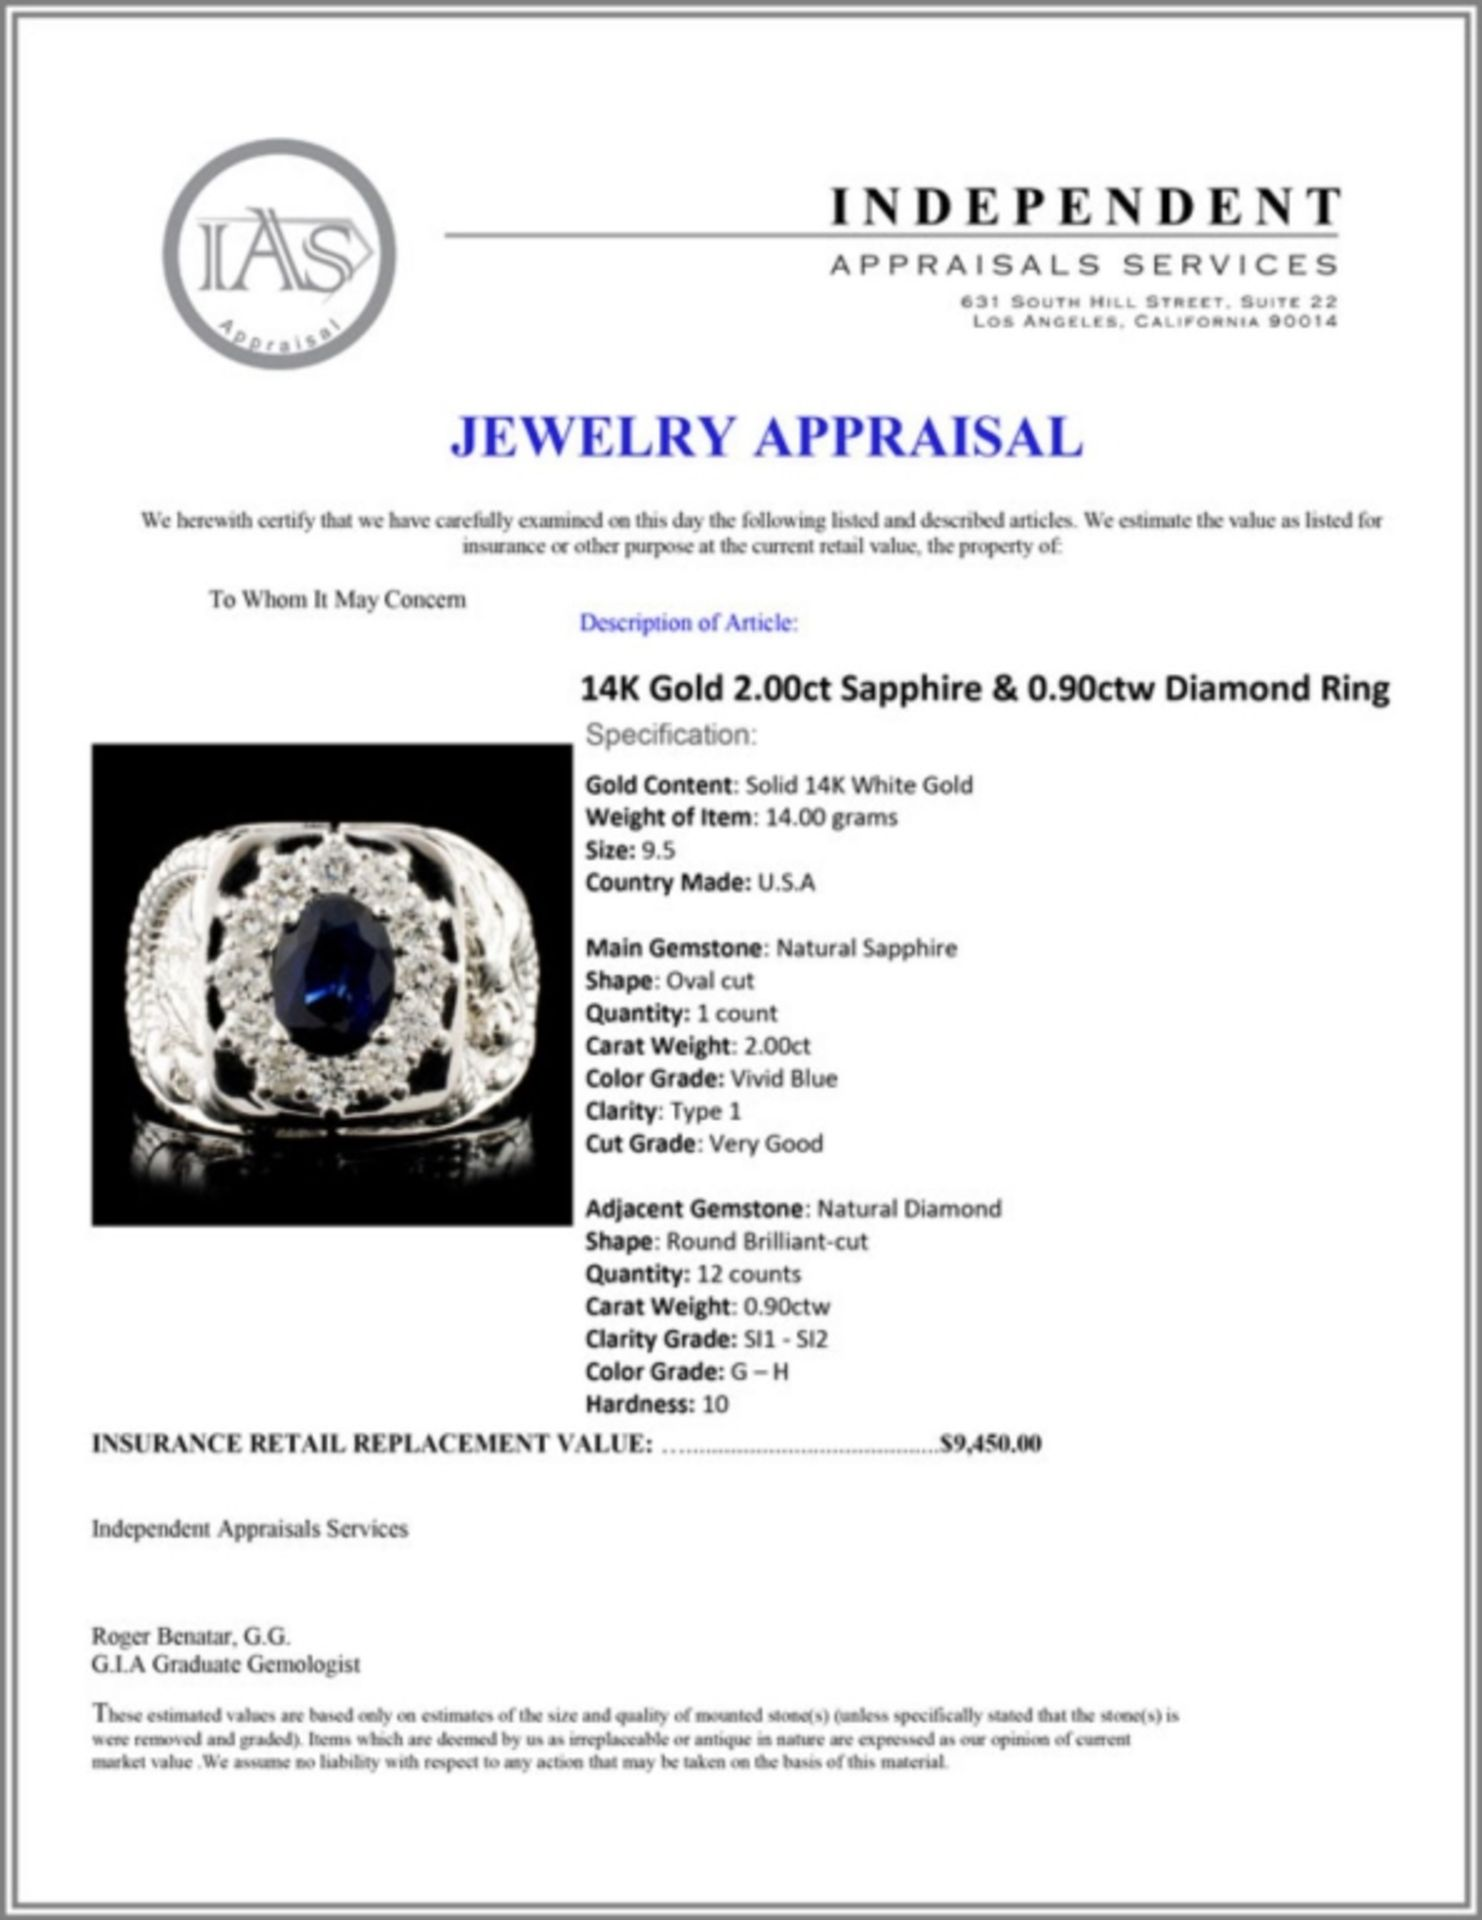 14K Gold 2.00ct Sapphire & 0.90ctw Diamond Ring - Image 5 of 5